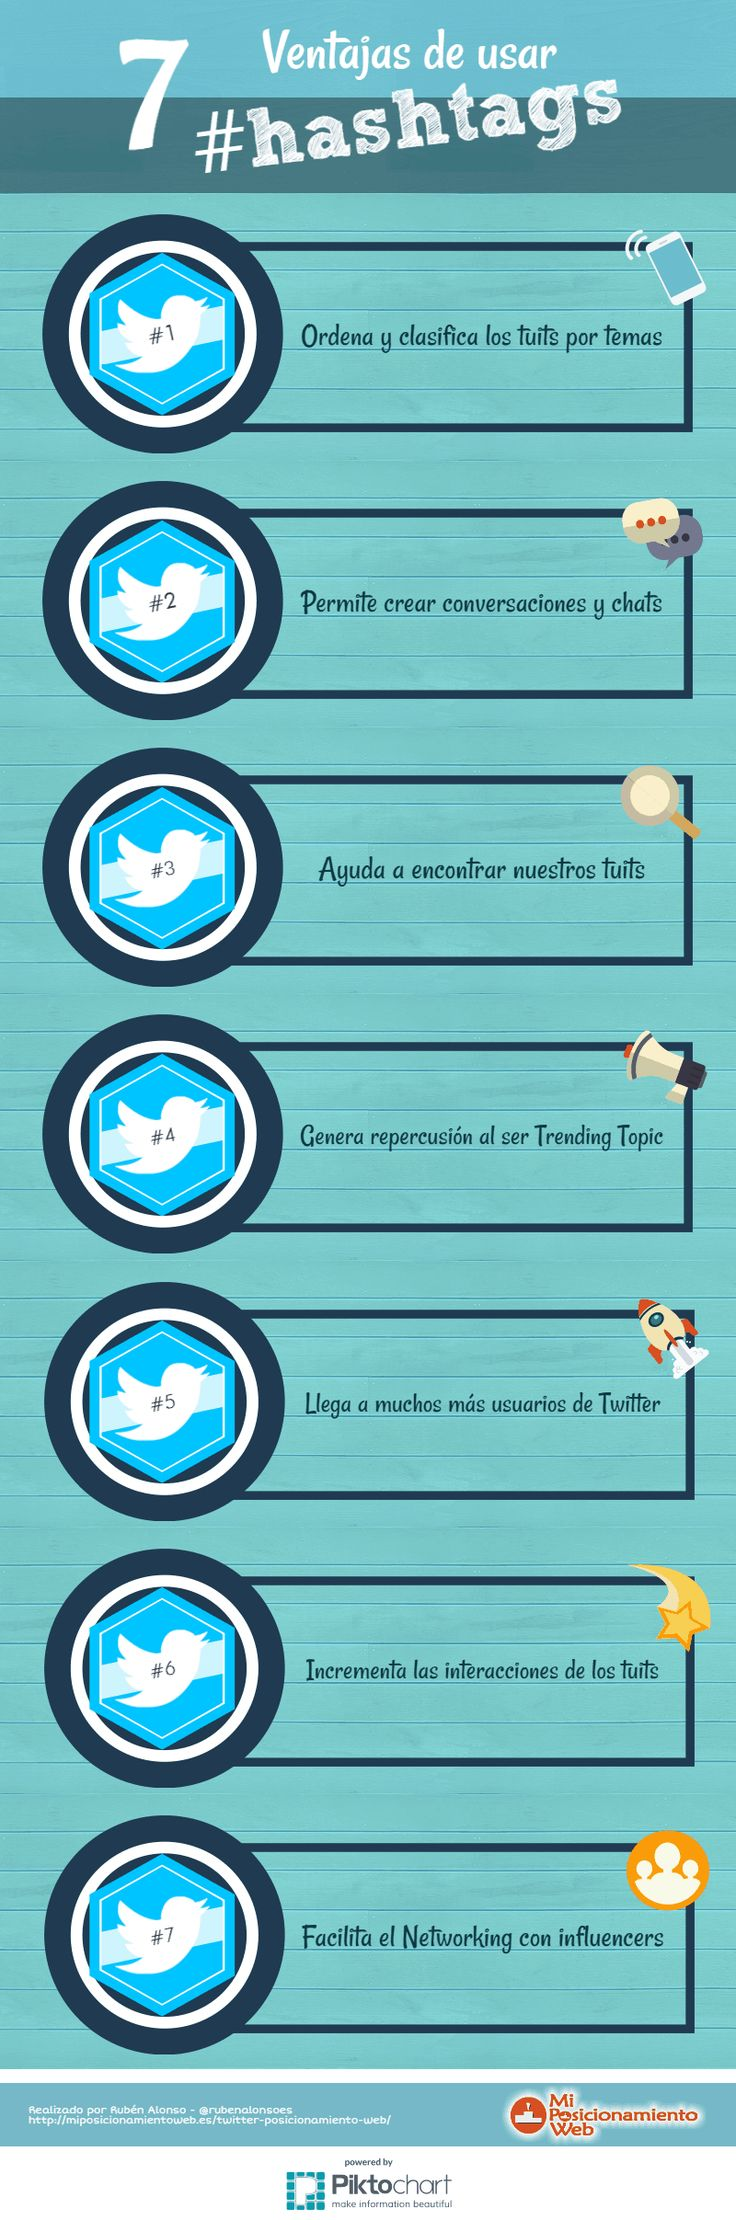 7 Ventajas de usar Hashtags